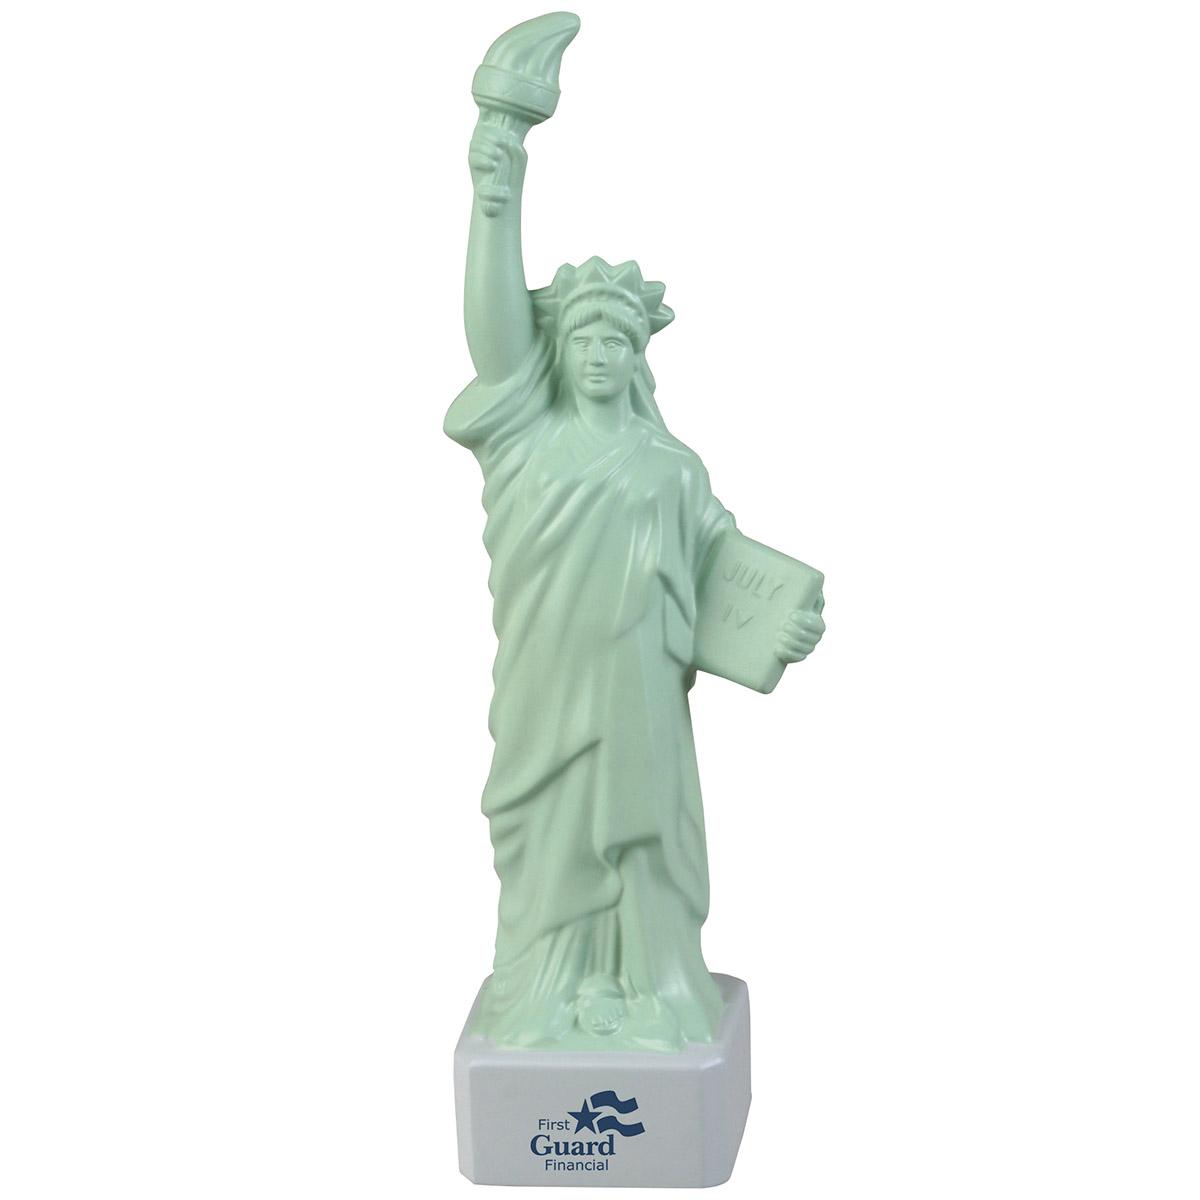 Statue of Liberty Stress Reliever, LPA-SL30 - 1 Colour Imprint